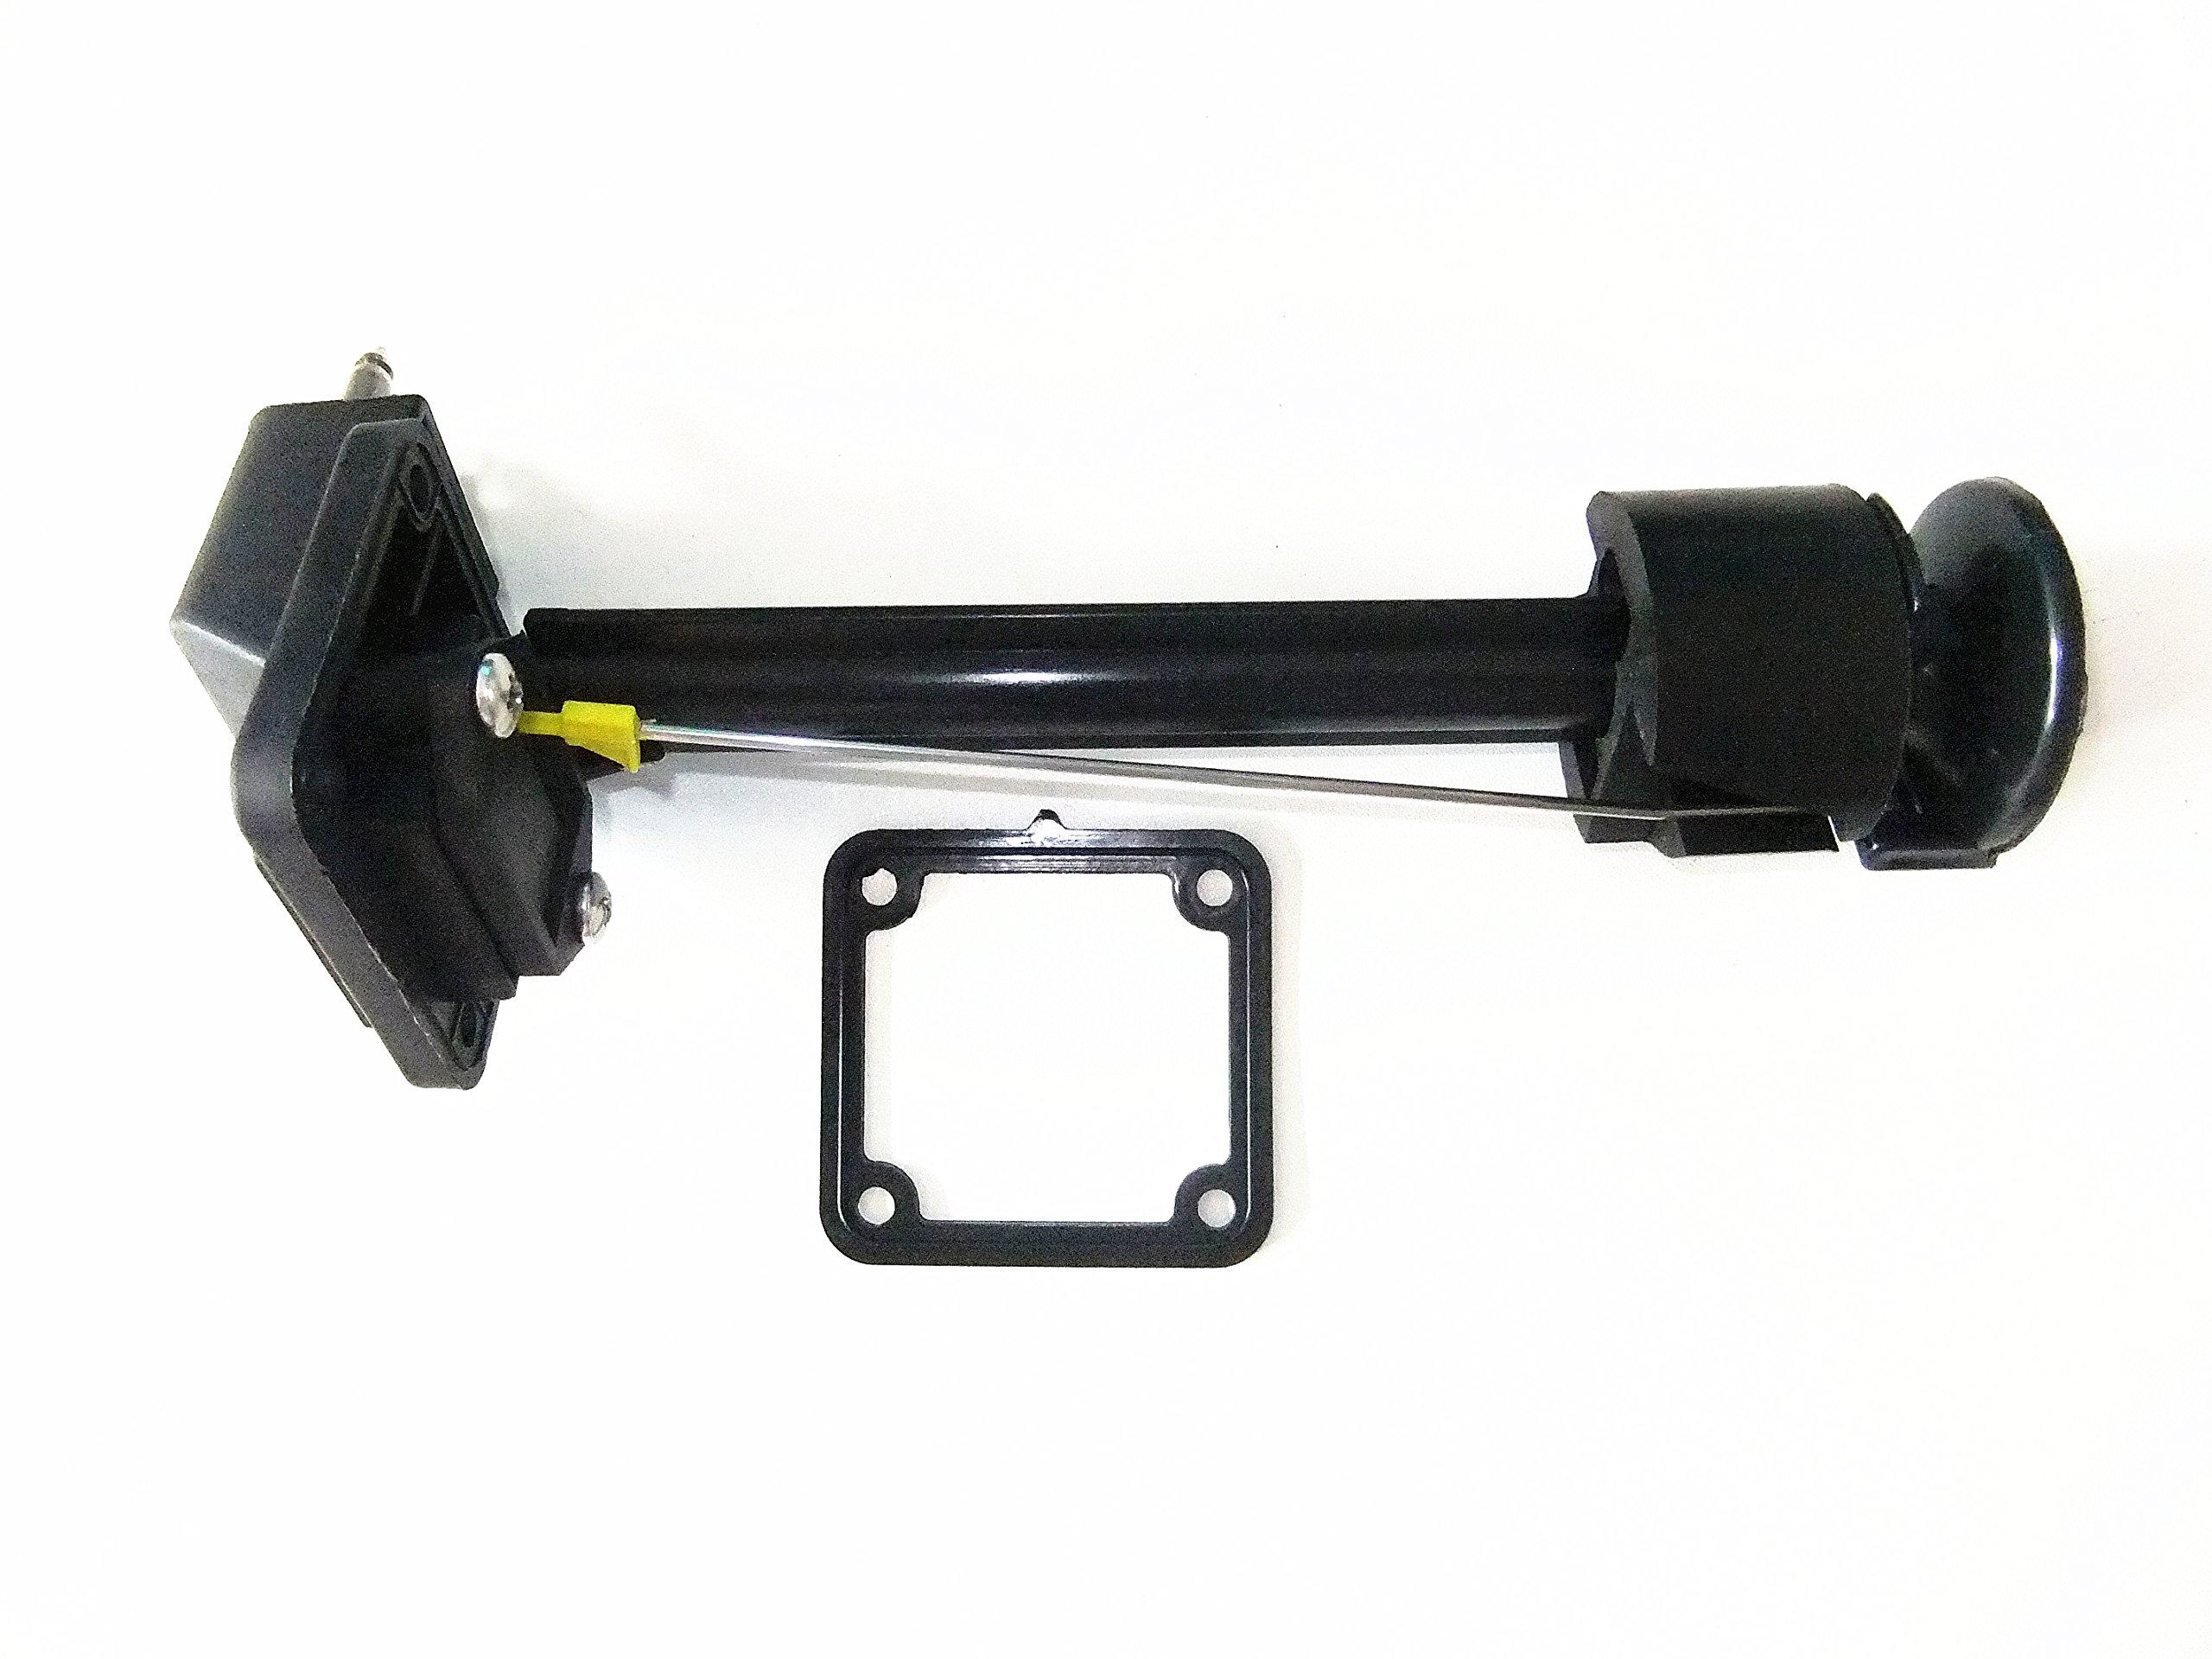 Fuel Gauge / Fuel Meter Assy for Yamaha Outboard Motor 12L 24L External Fuel Tank 6YJ-24260-00 6Y1-24260-12